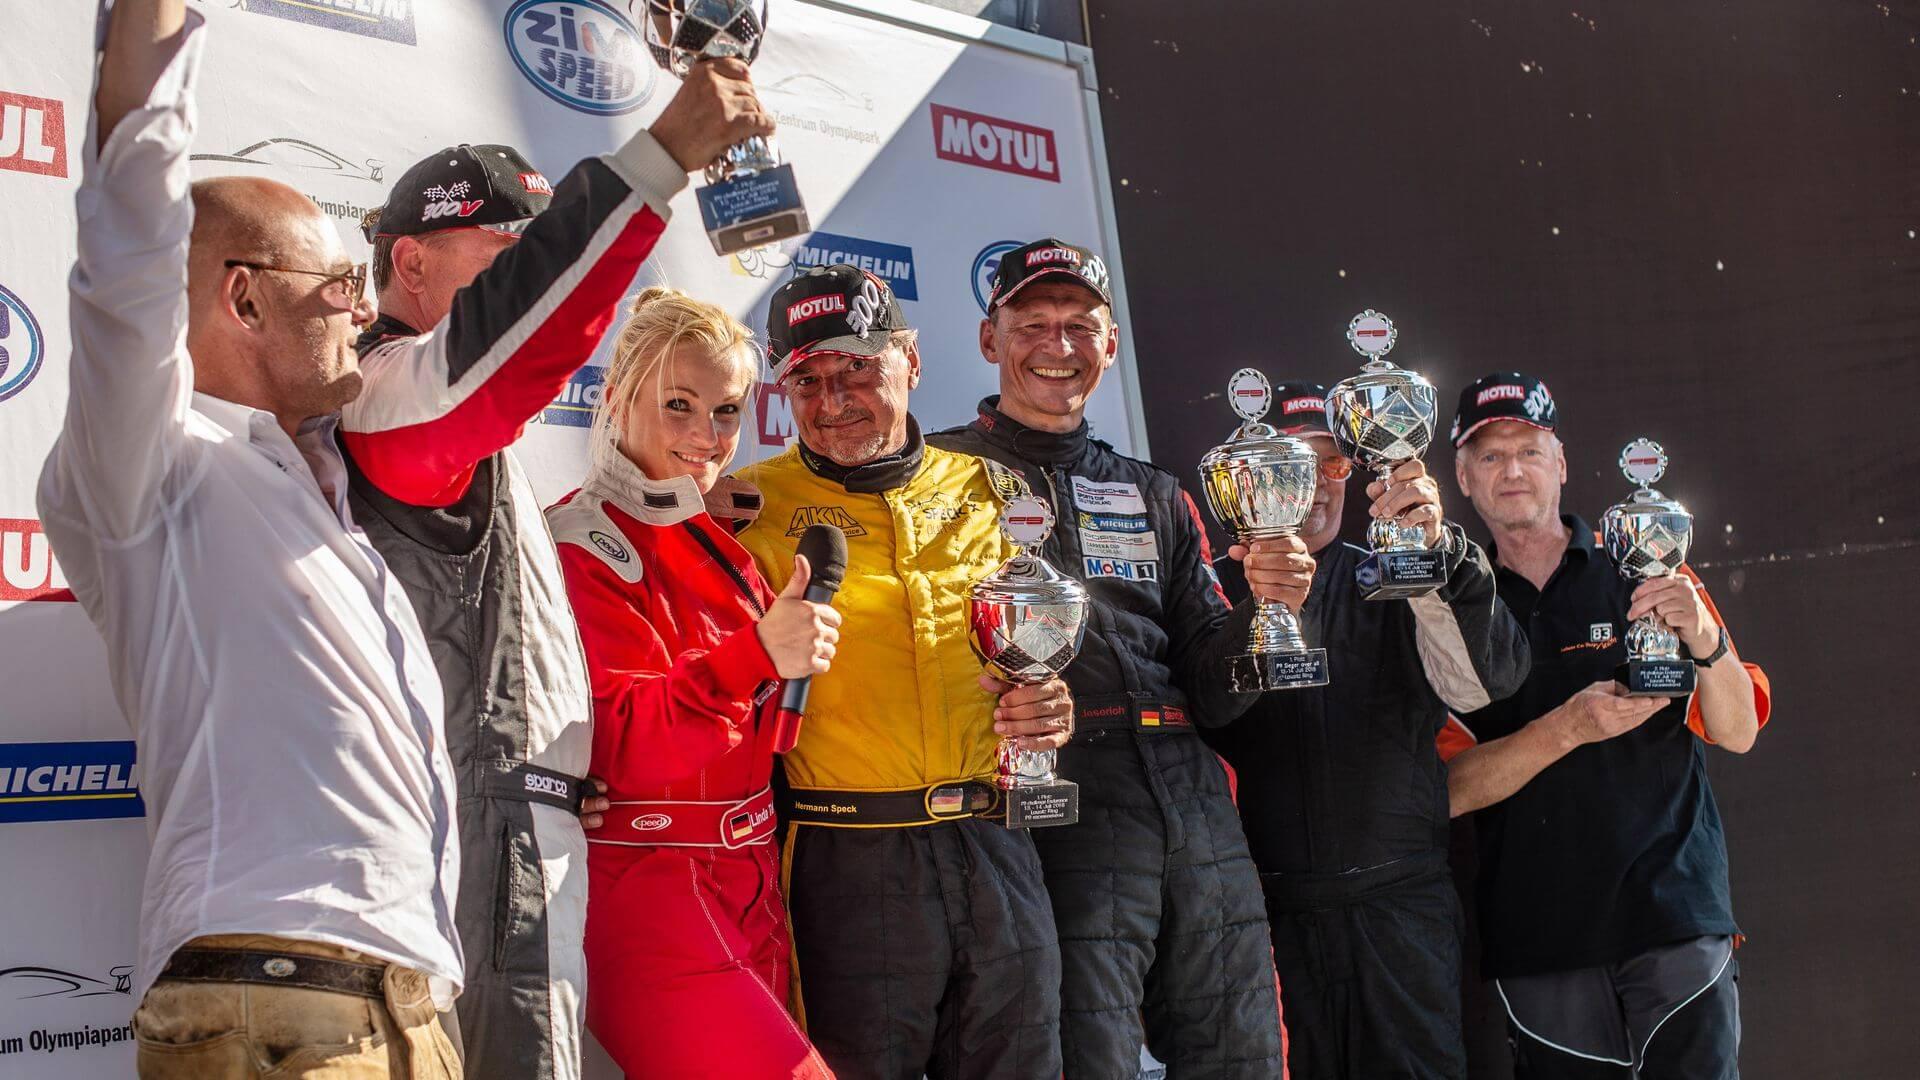 P9 Race Weekend Gewinner mit Pokal